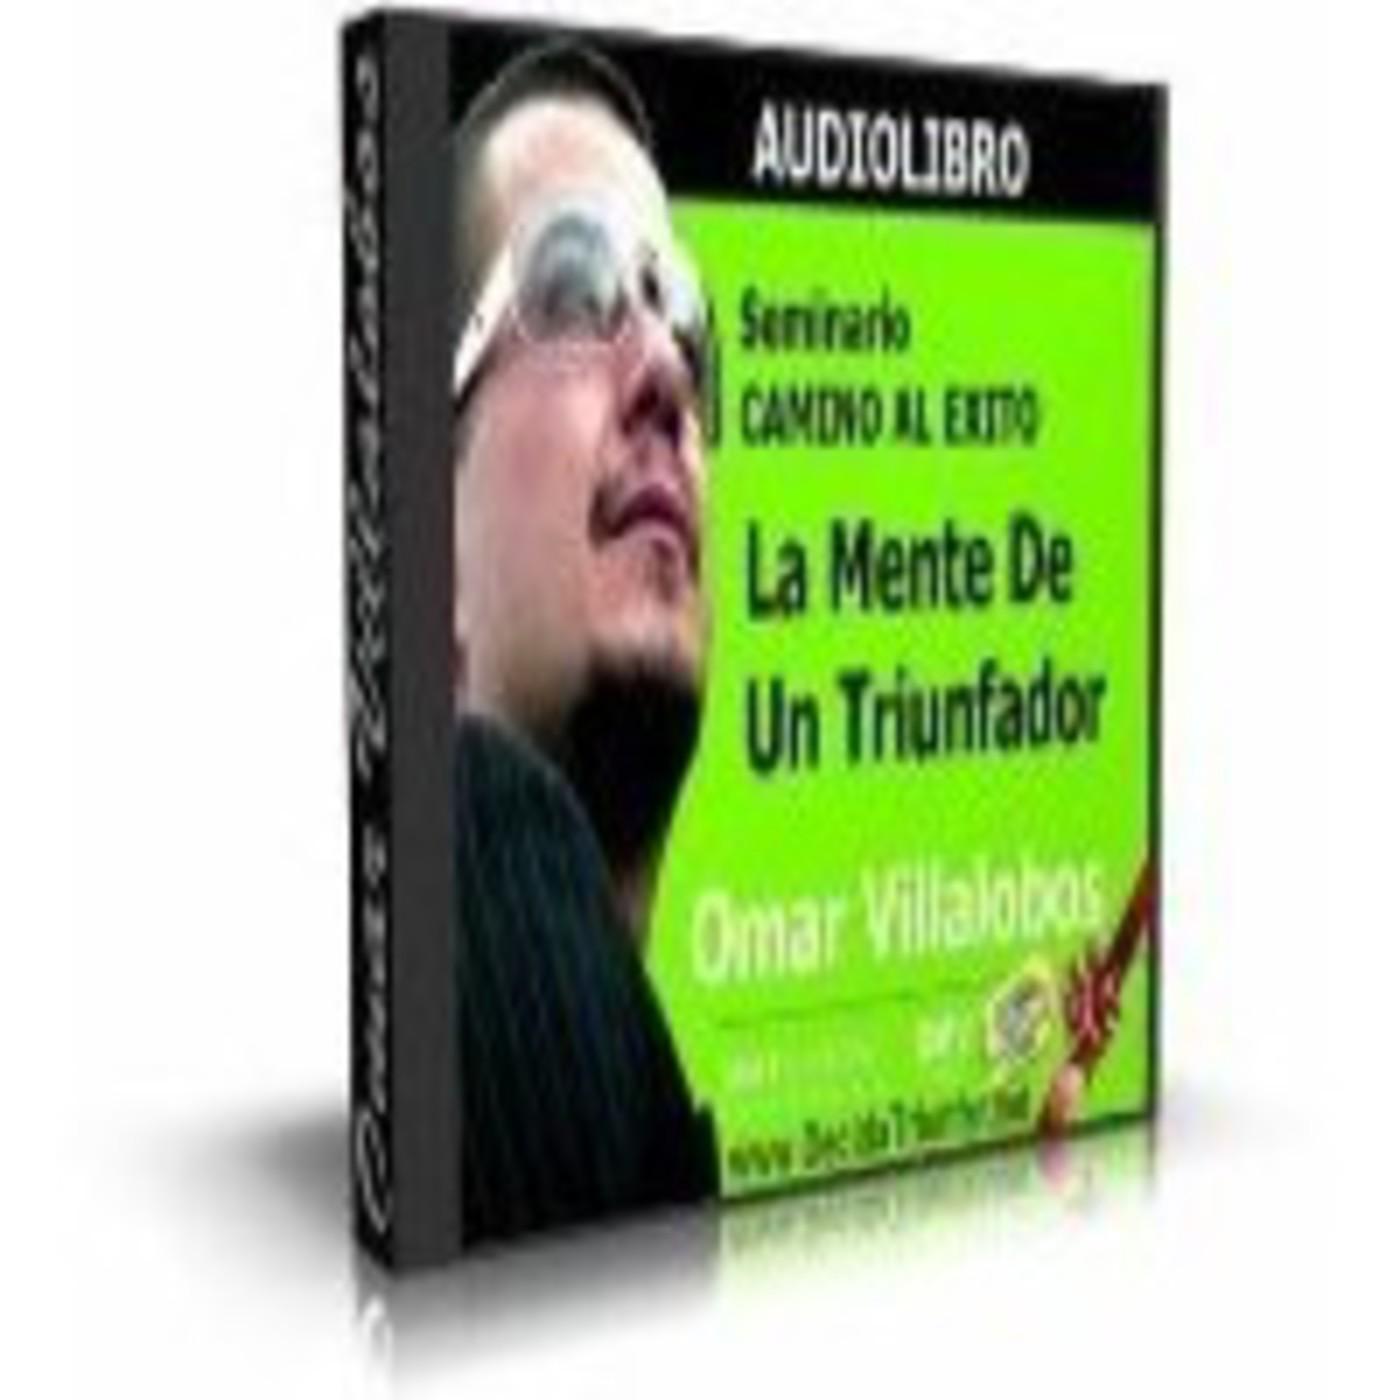 MENTE DE TRIUNFADOR PDF DOWNLOAD